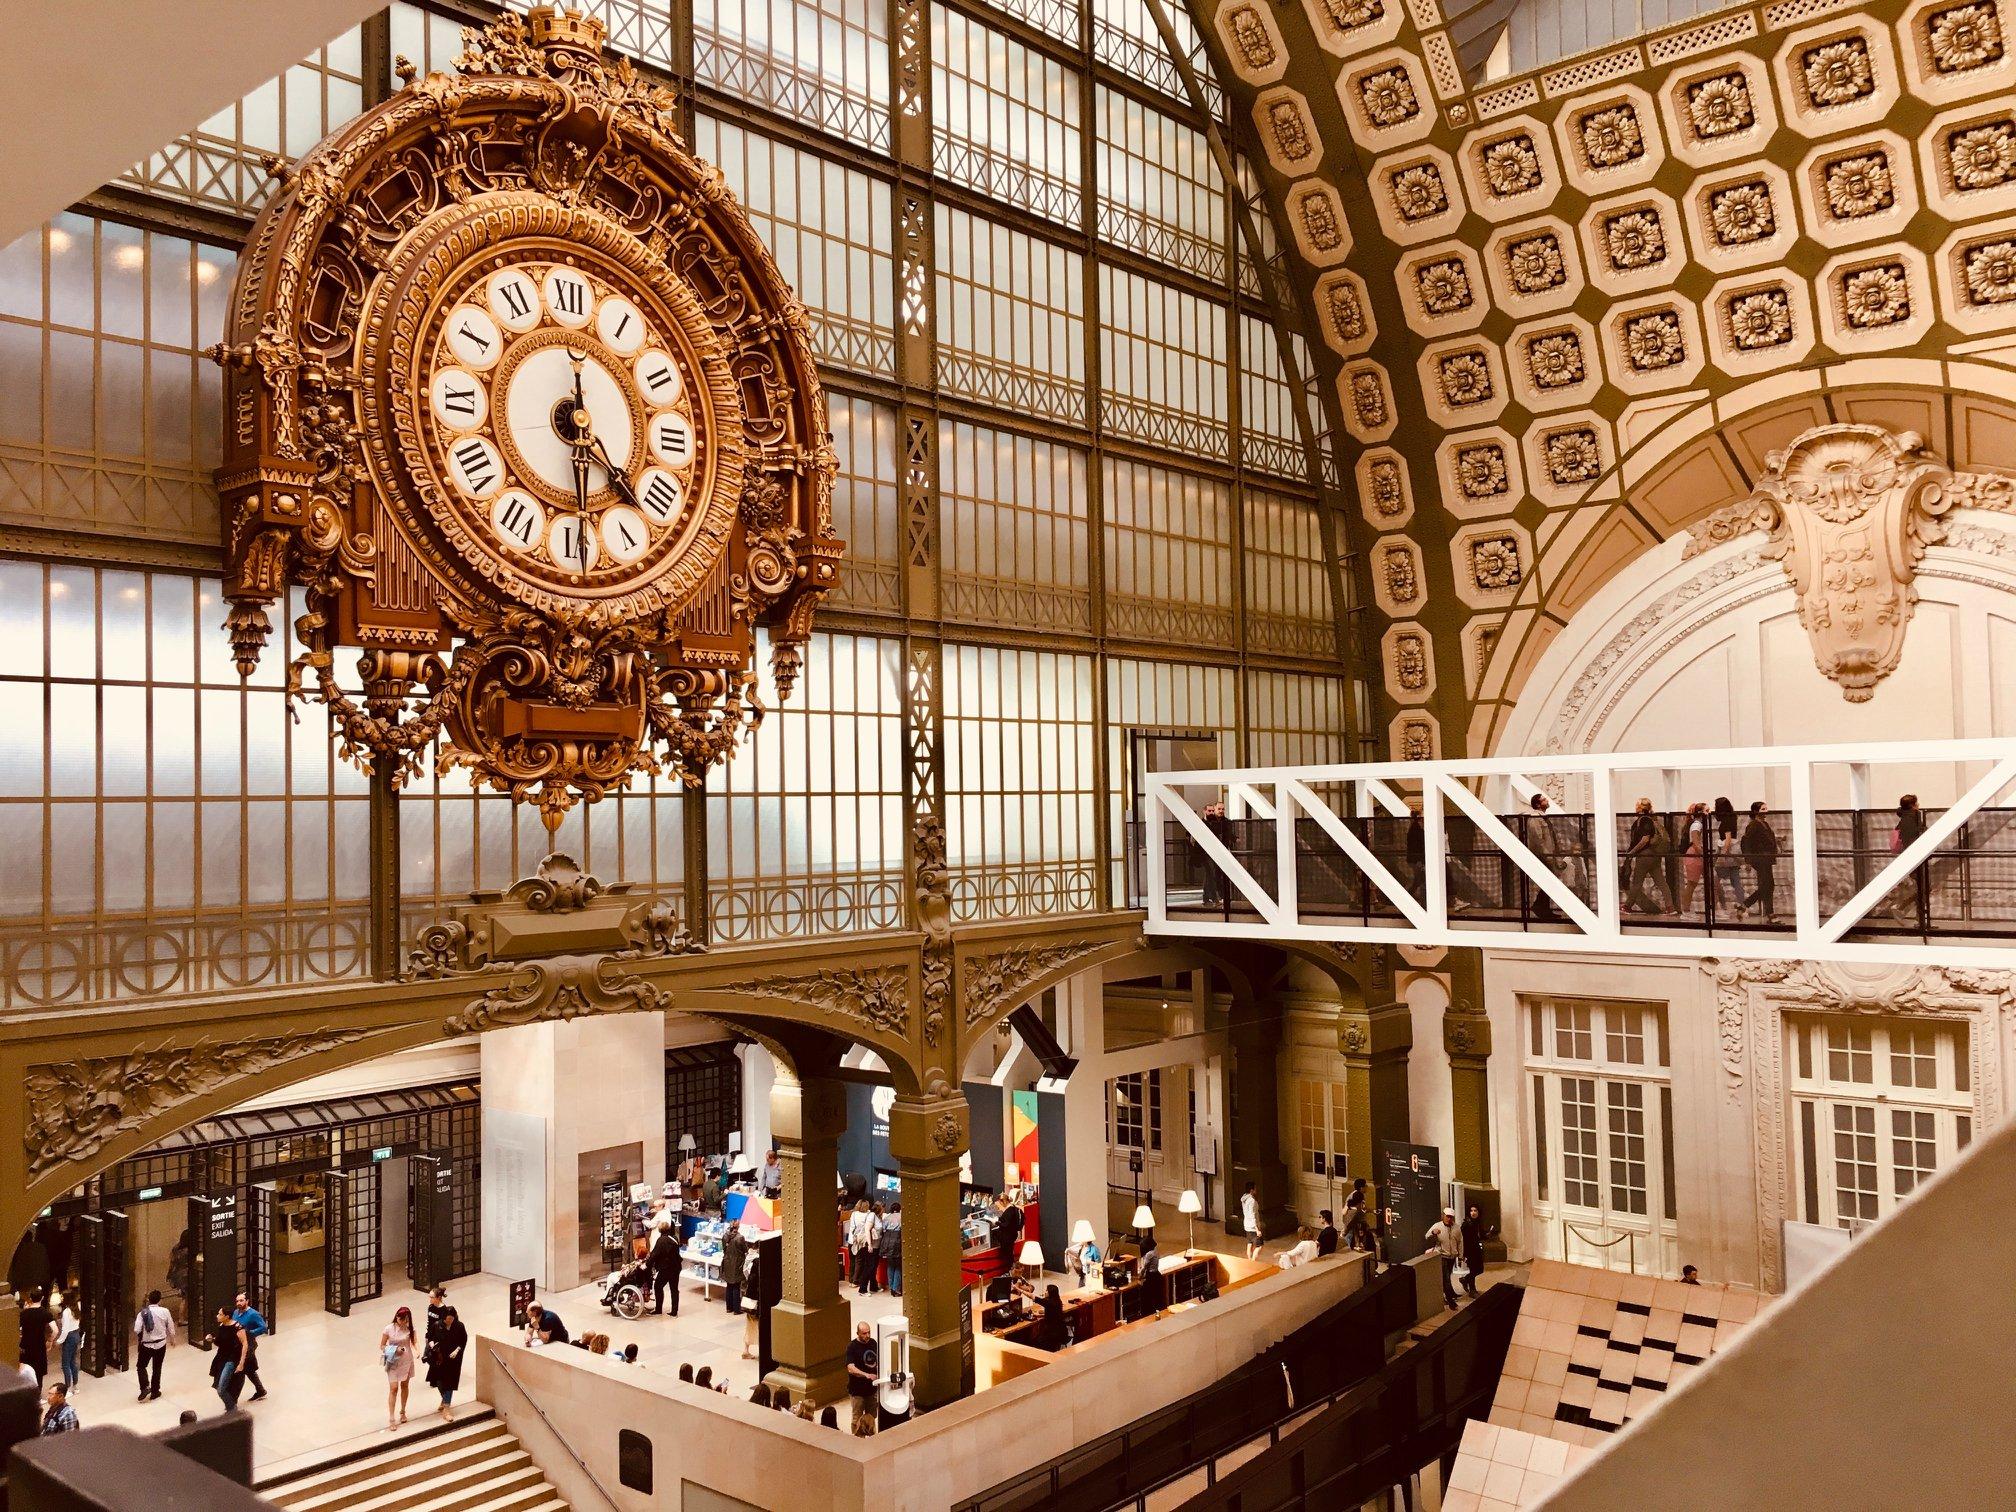 Musée d'Orsay, fot. Armand KhouryUnsplash.com, źródło: Biblioteka Gdynia